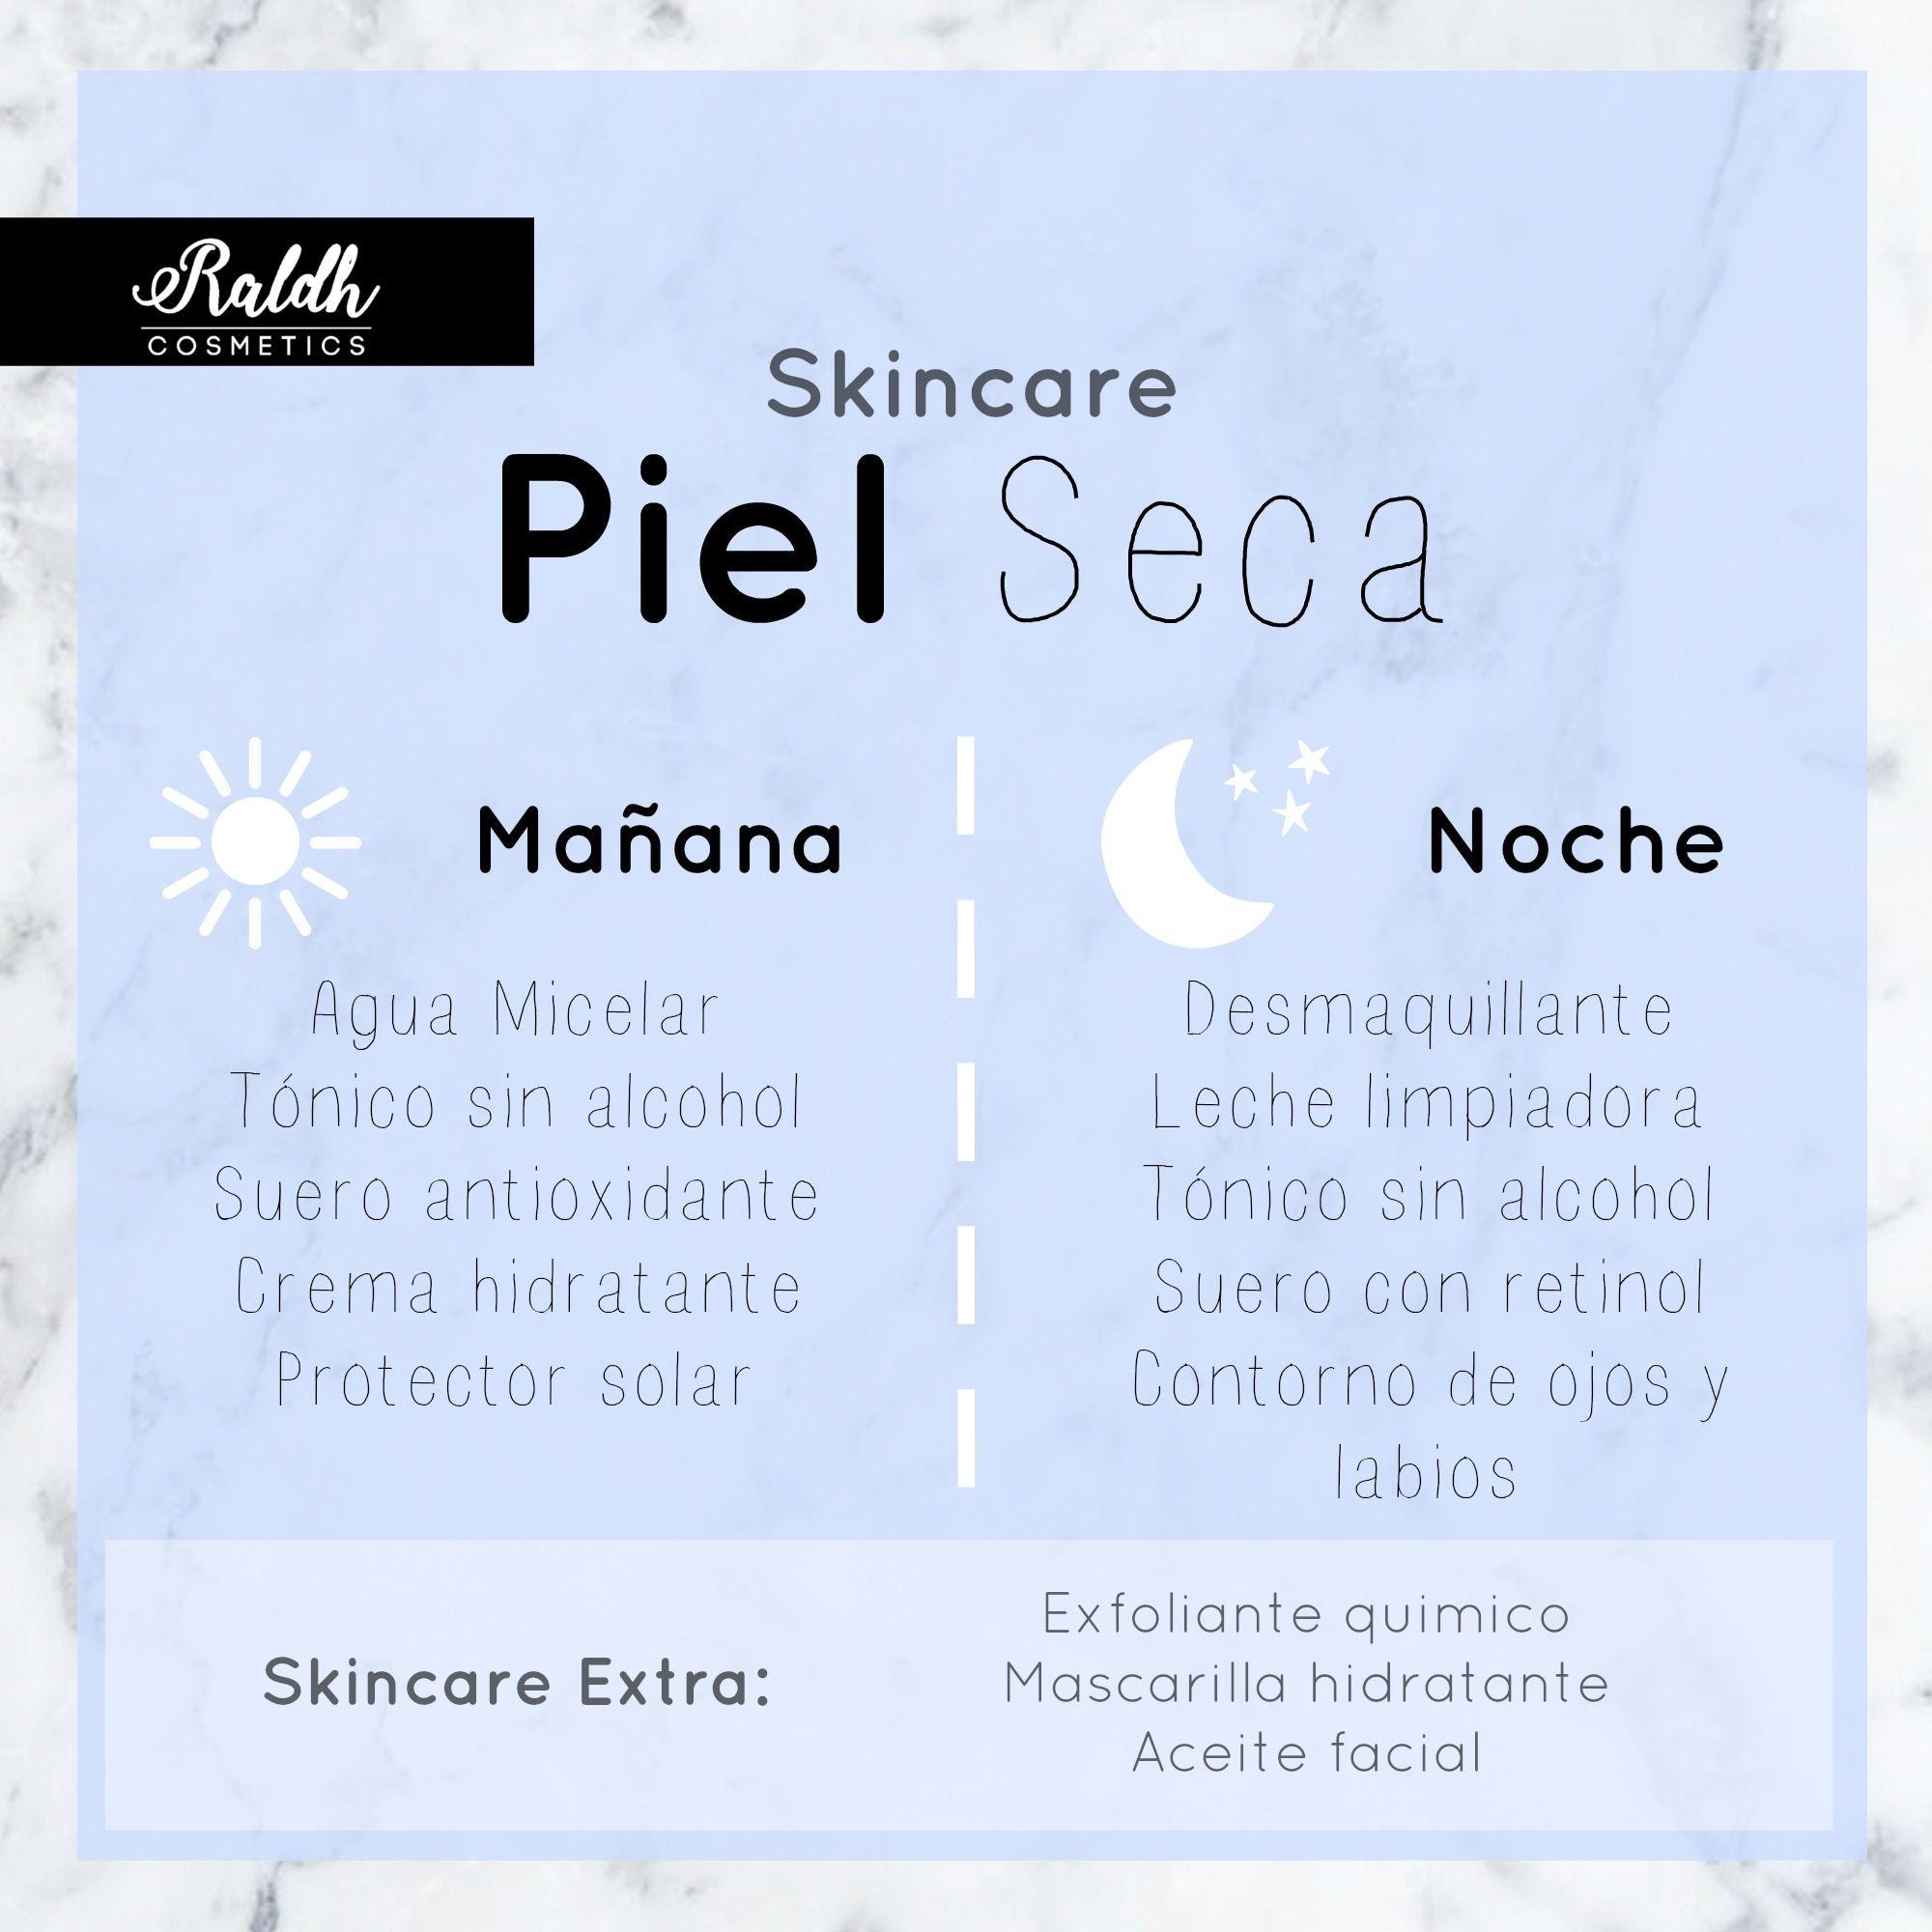 Makeup skin care - [Shelfie] Hautpflege und BeautySüchtigShelfie! #skincare